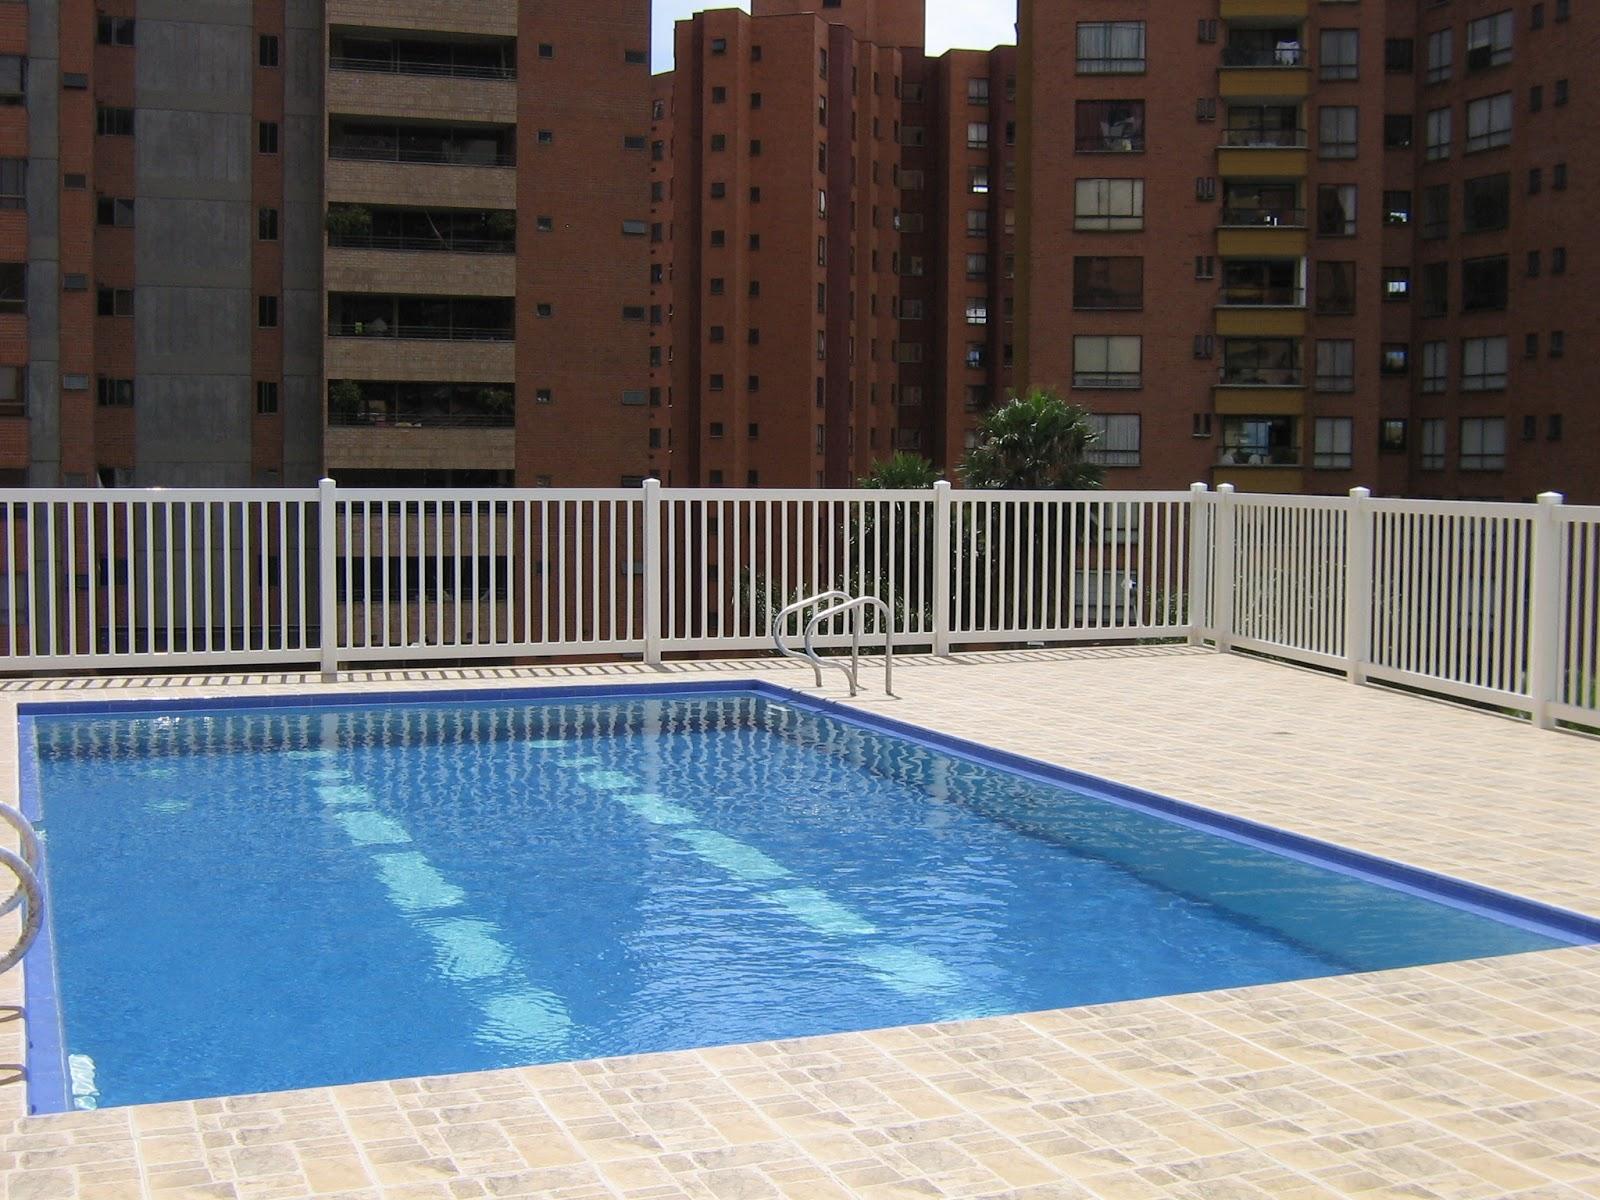 piscinas integrales sas cerramientos para piscinas